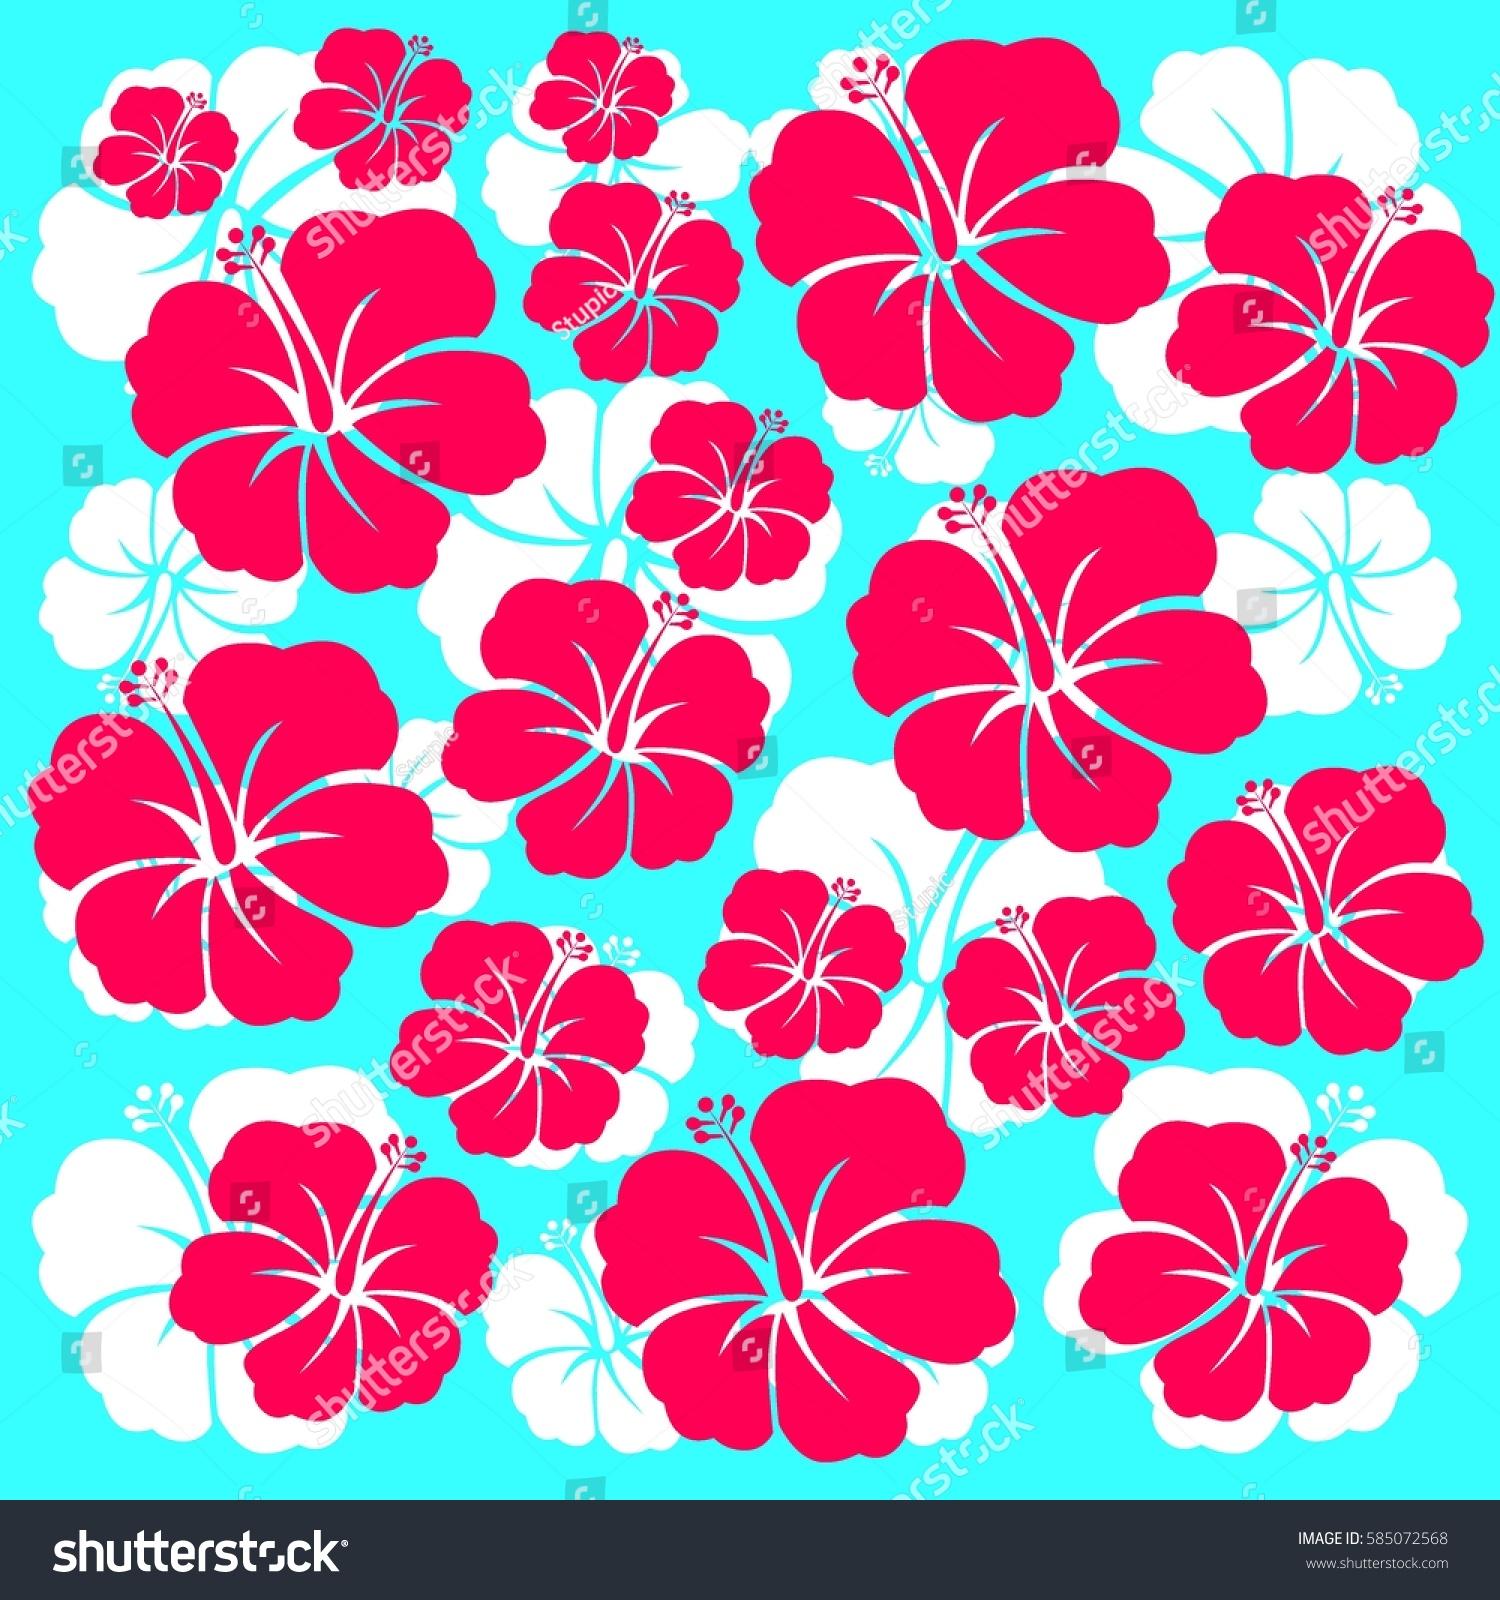 Royalty free hawaii illustration vector template 585072568 stock hawaii illustration vector template 585072568 izmirmasajfo